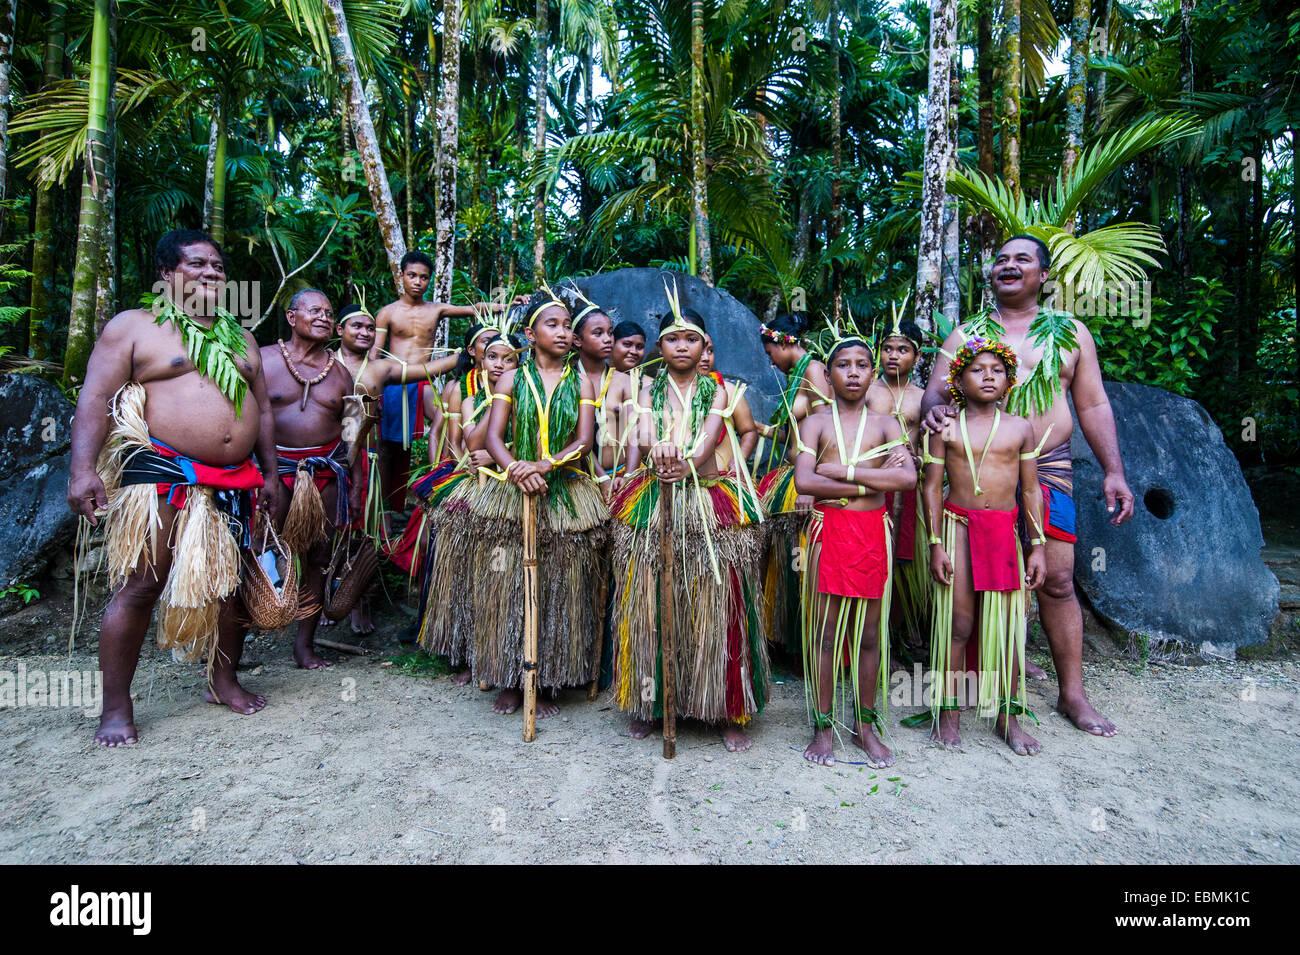 Traditionally dressed islanders, Yap Island, Caroline Islands, Micronesia - Stock Image